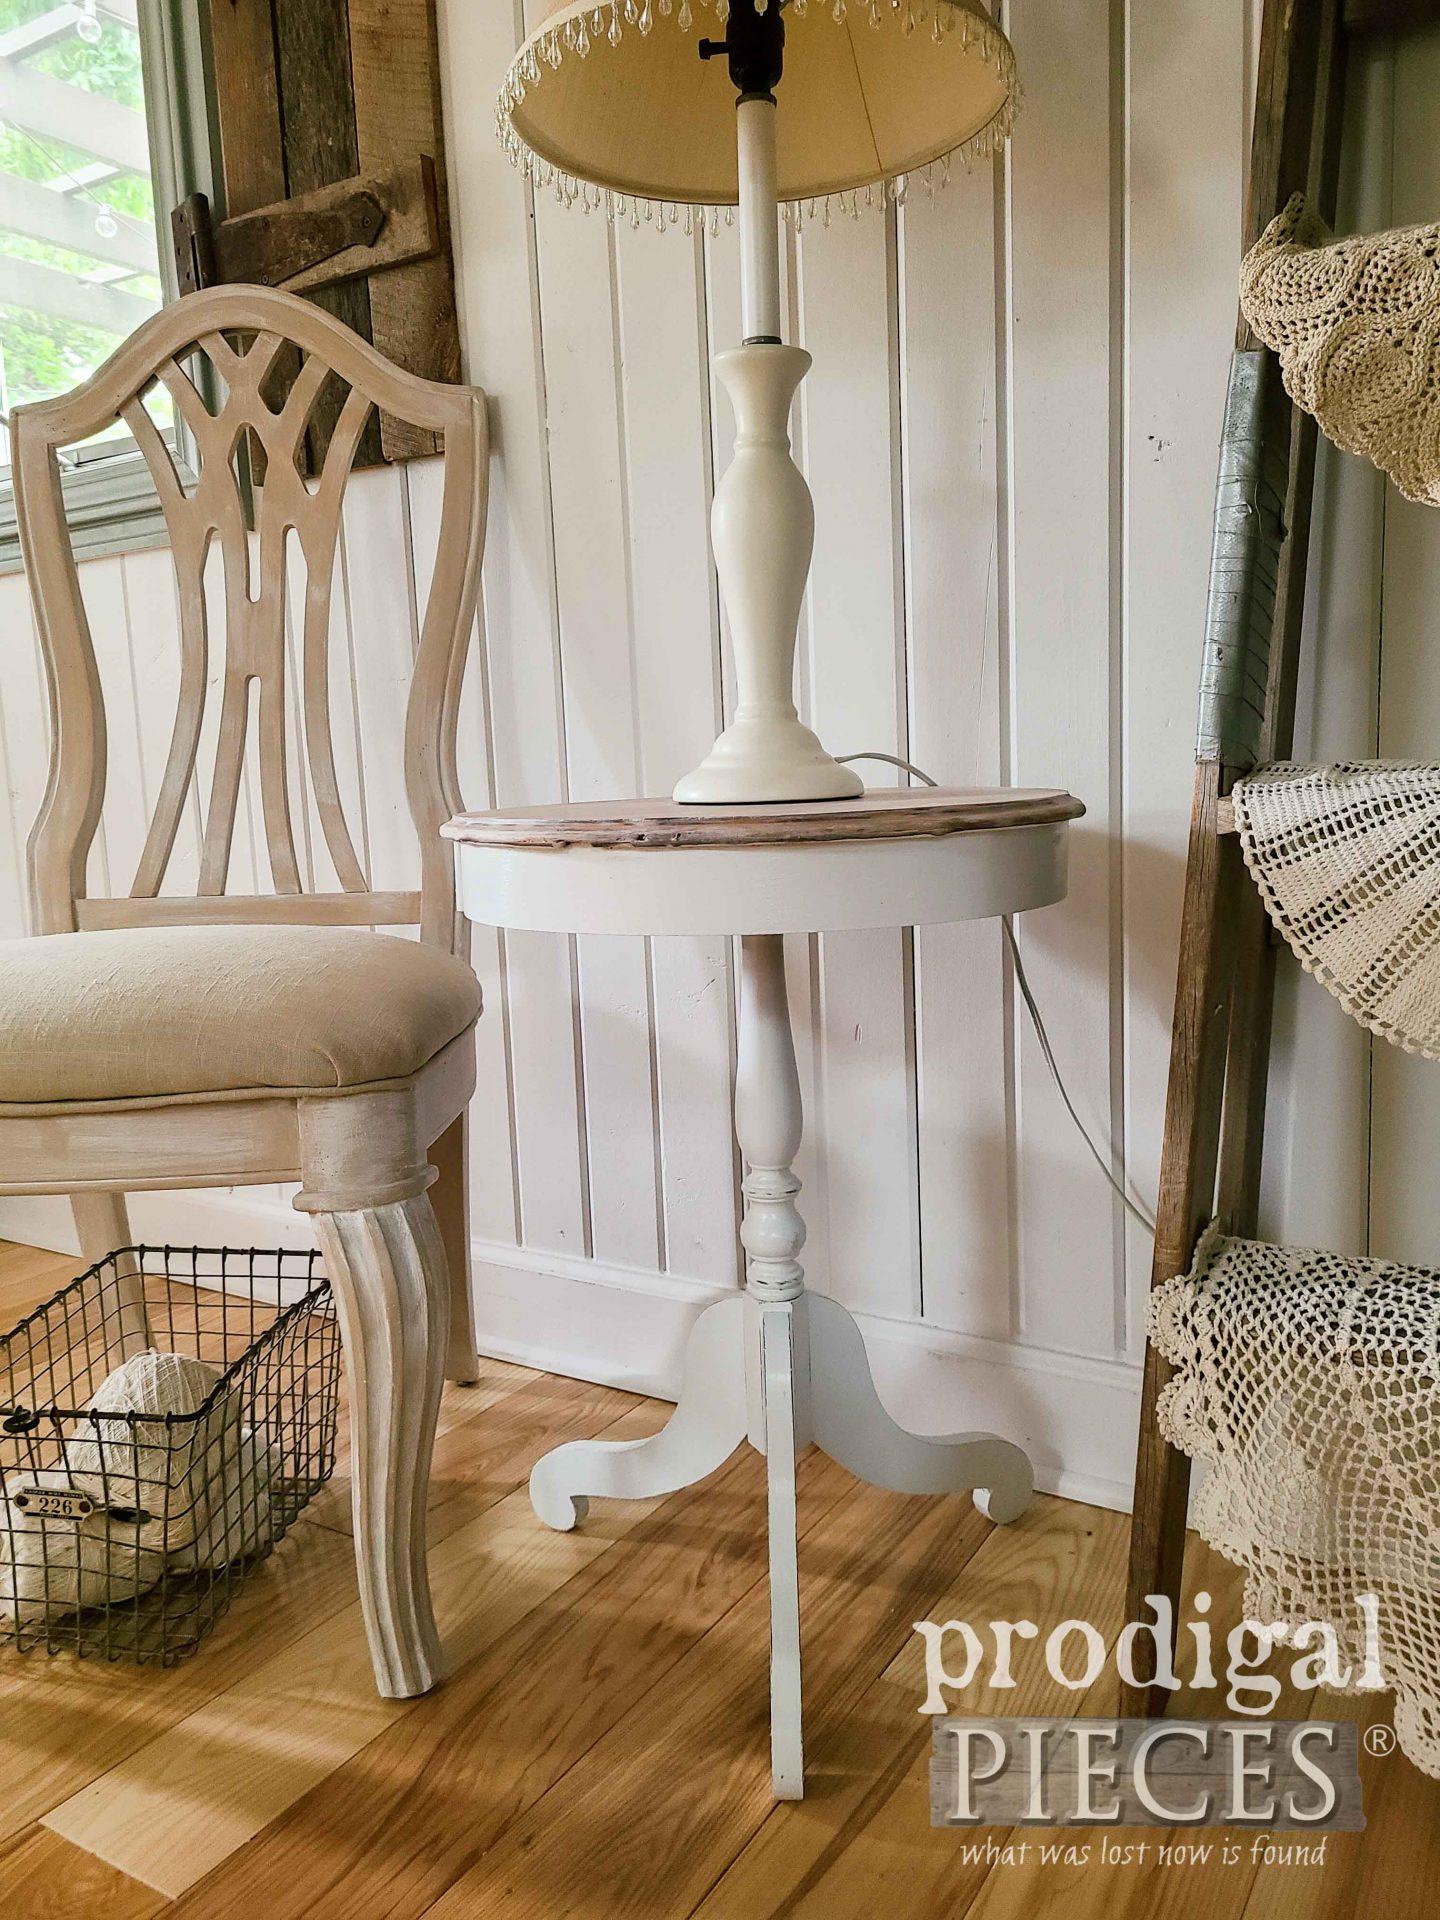 Small Antique Drum Table Refinished by Larissa of Prodigal Pieces | prodigalpieces.com #prodigalpieces #antique #furniture #farmhouse #home #diy #homedecor